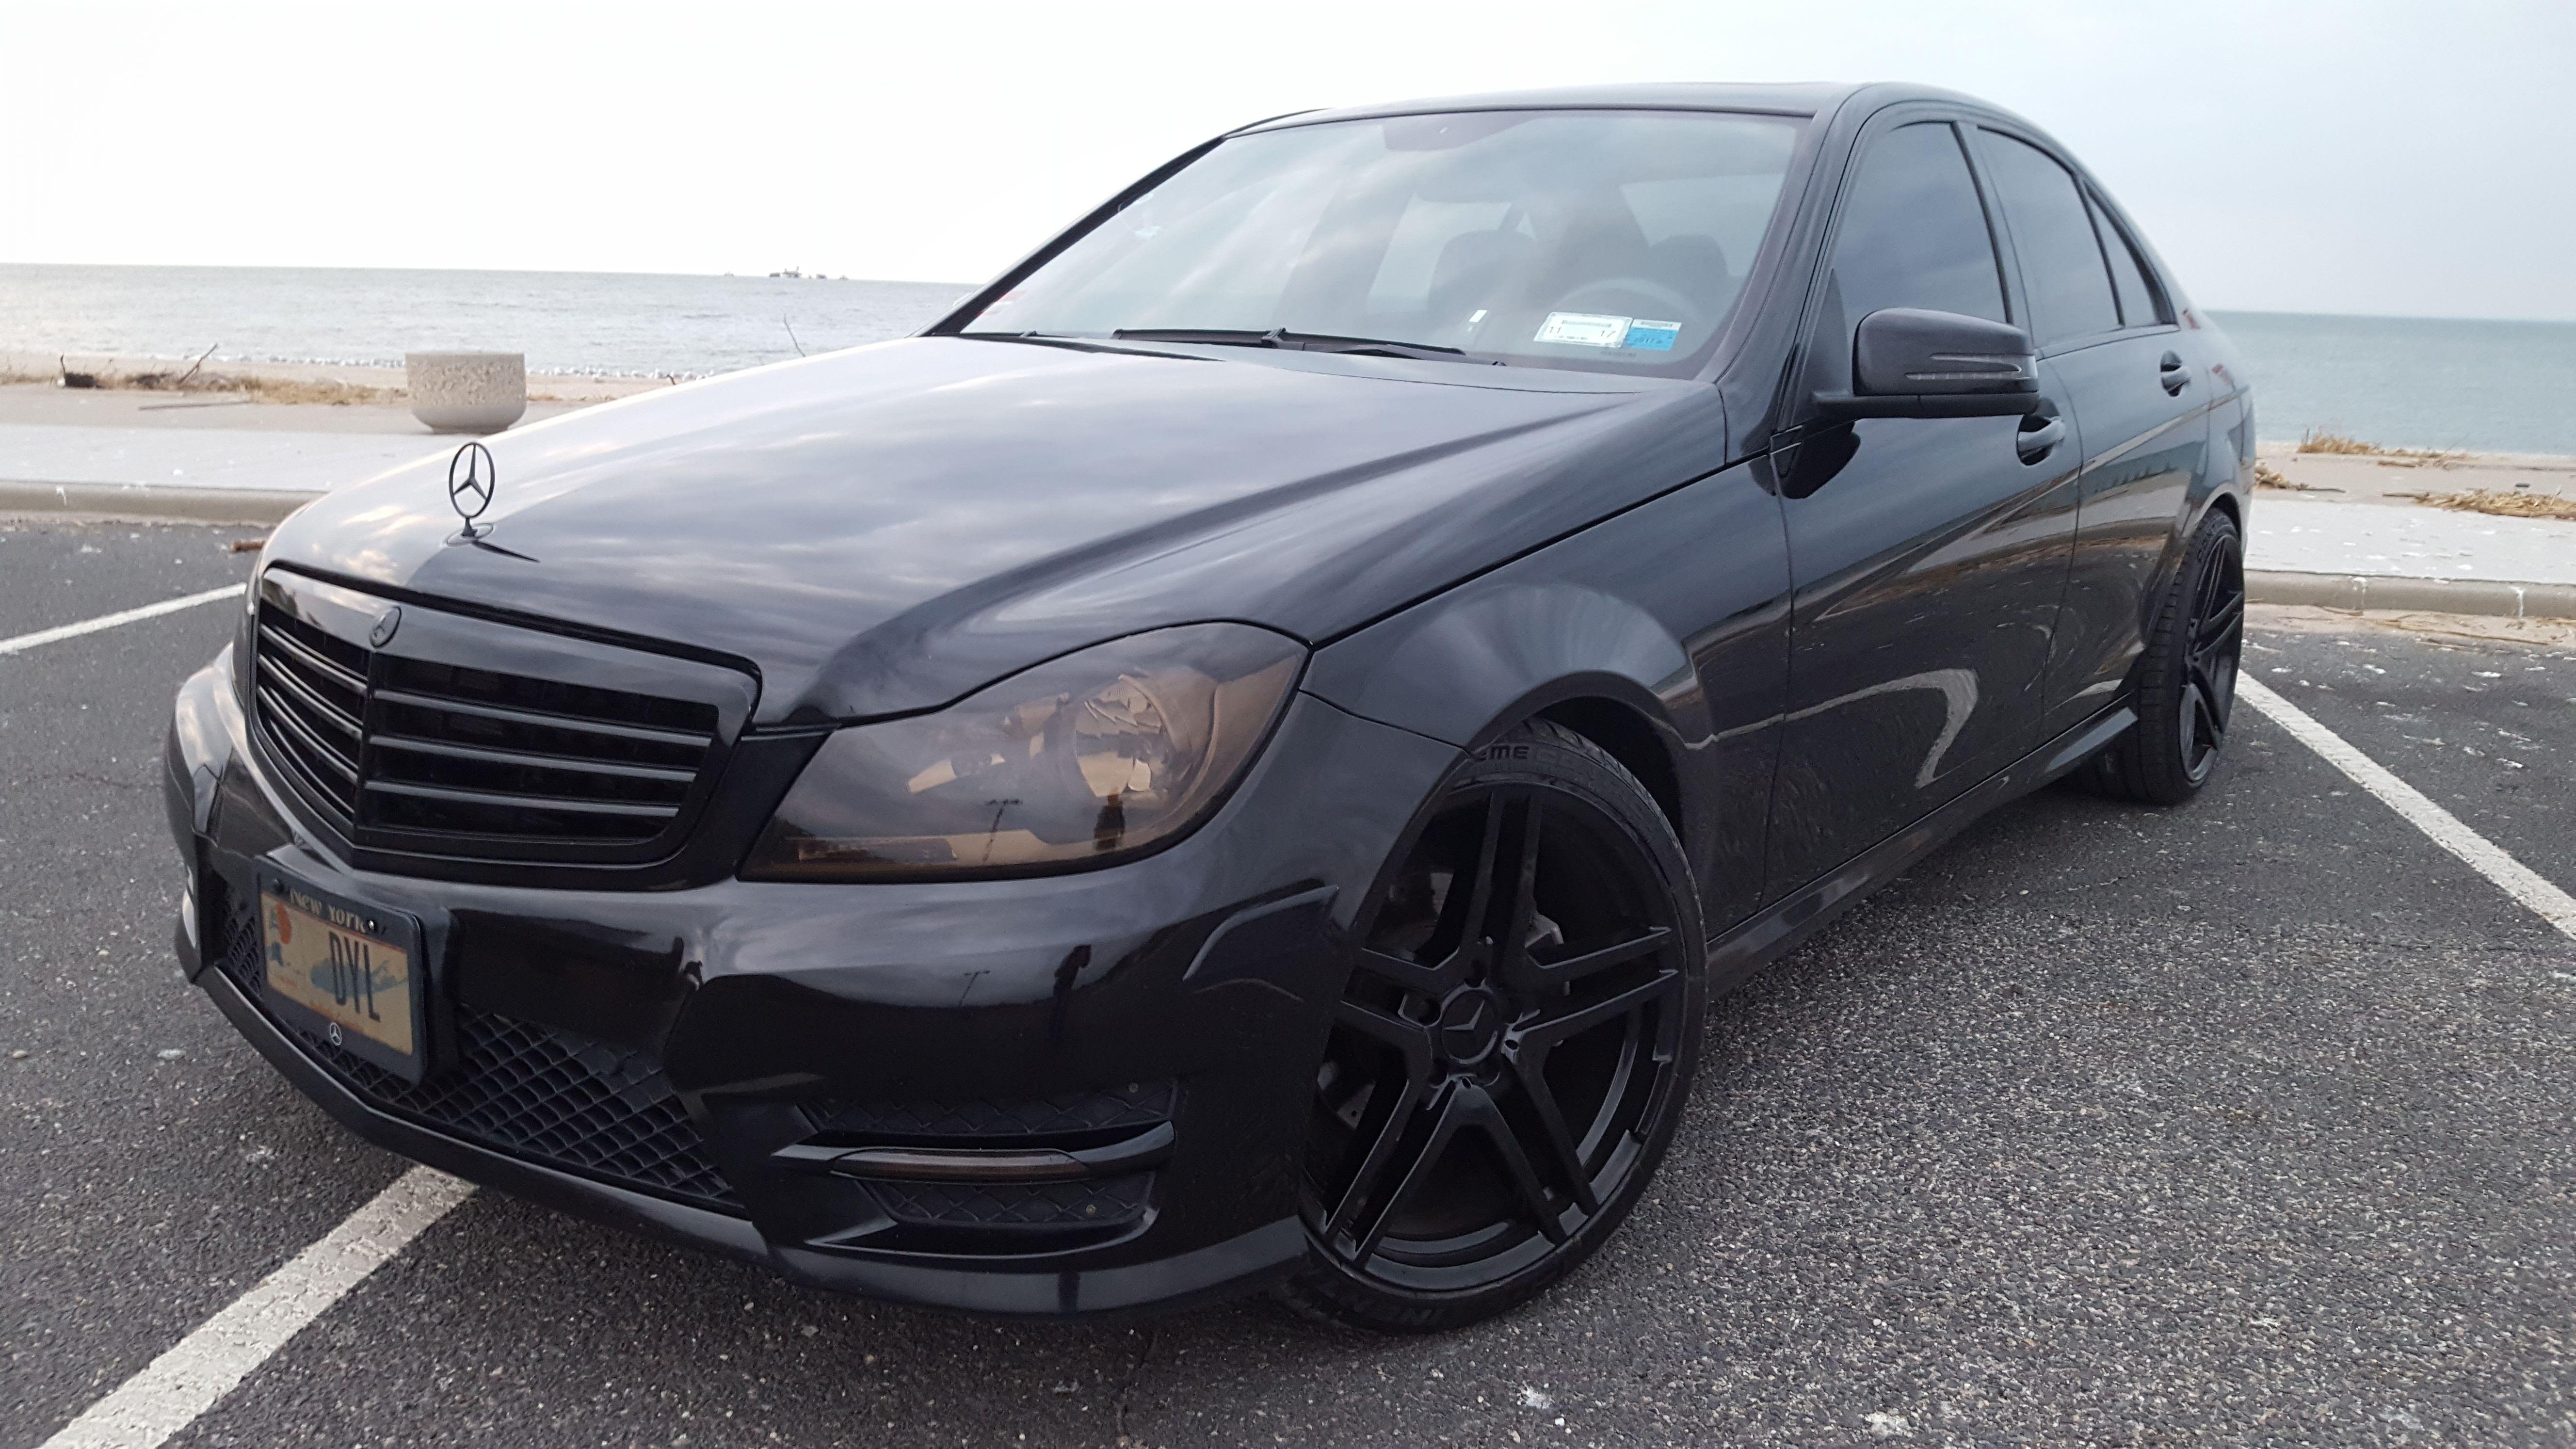 2012 C300 W204 Blacked Out Black On Black Mercedes C300